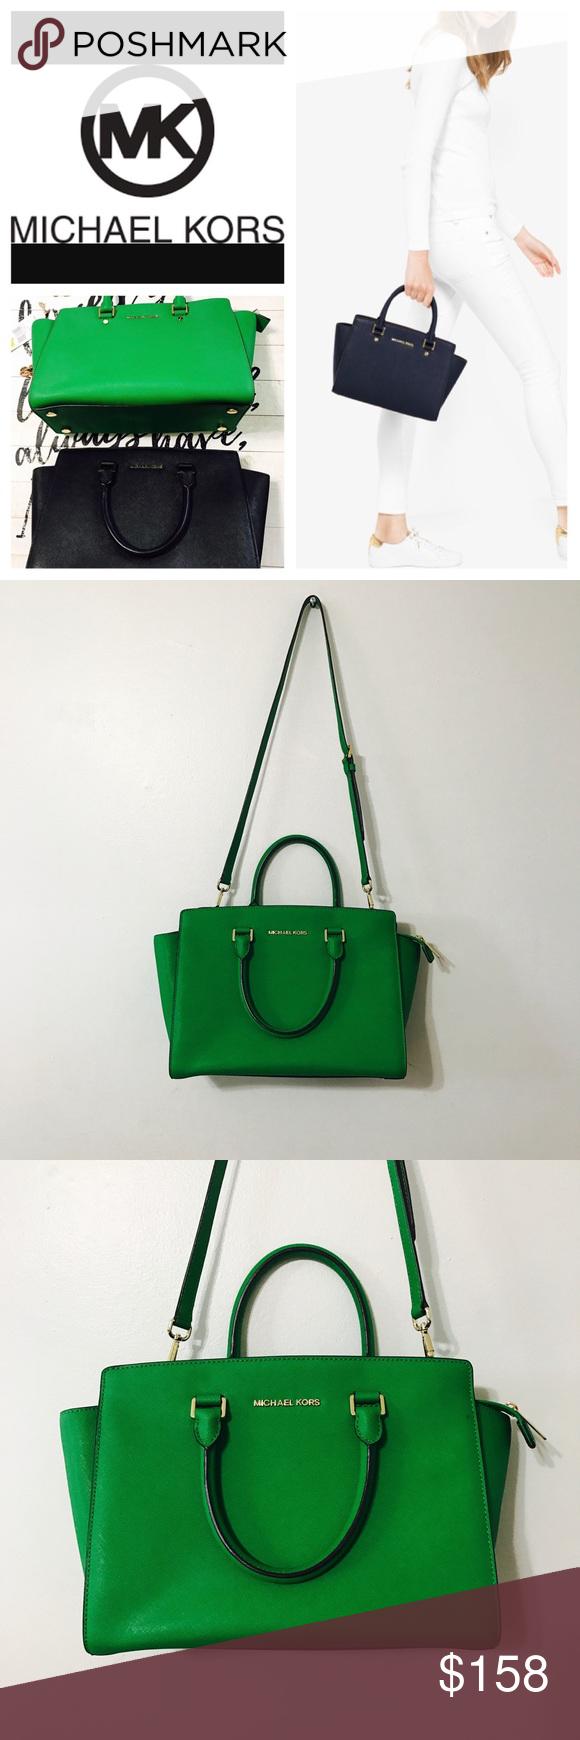 350c1e9ef7e2 ... coupon code for authentic michael kors selma green satchel fc811 d0658